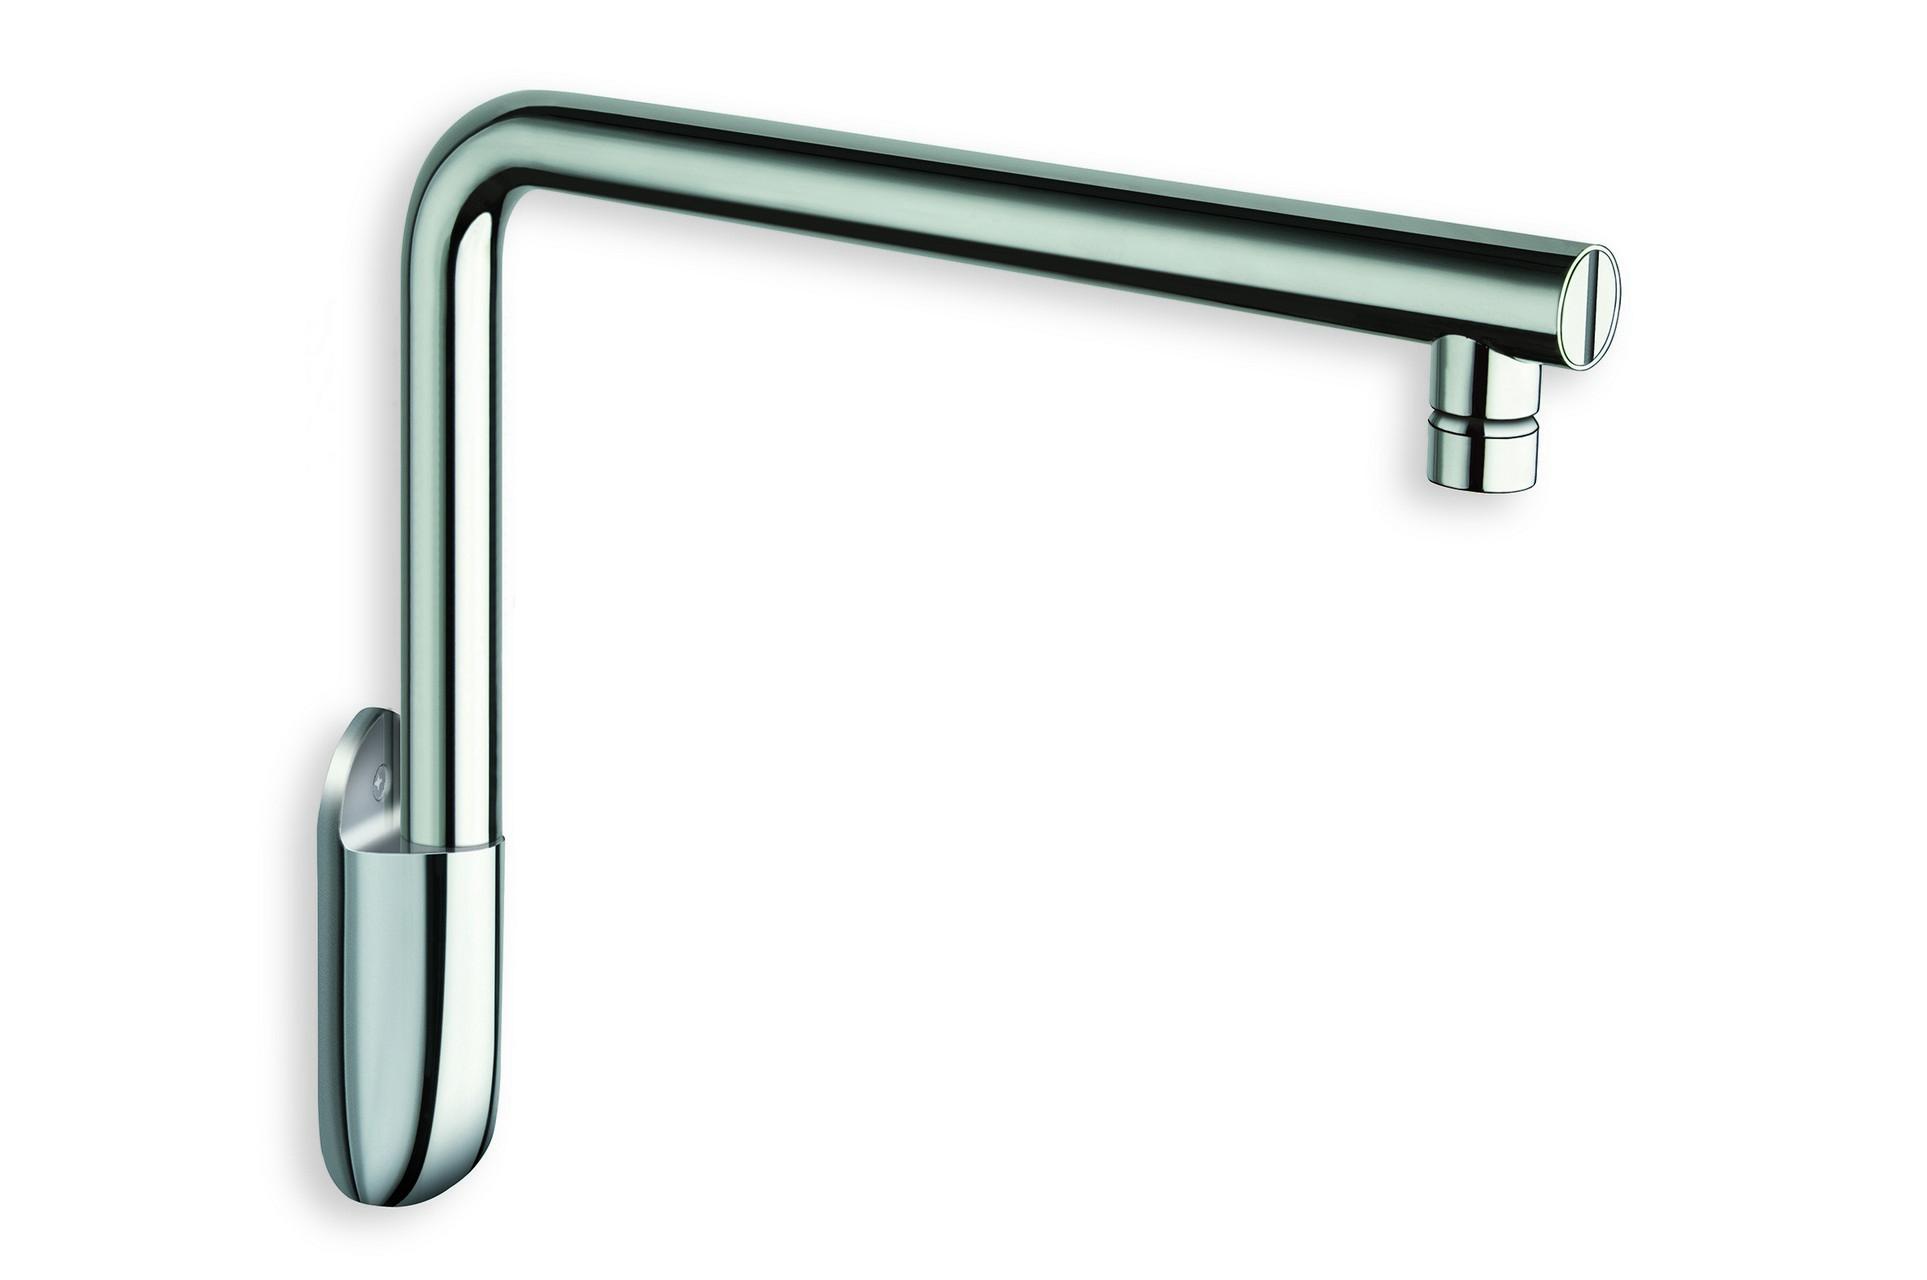 aquatica short wall mounted shower arm chrome. Black Bedroom Furniture Sets. Home Design Ideas